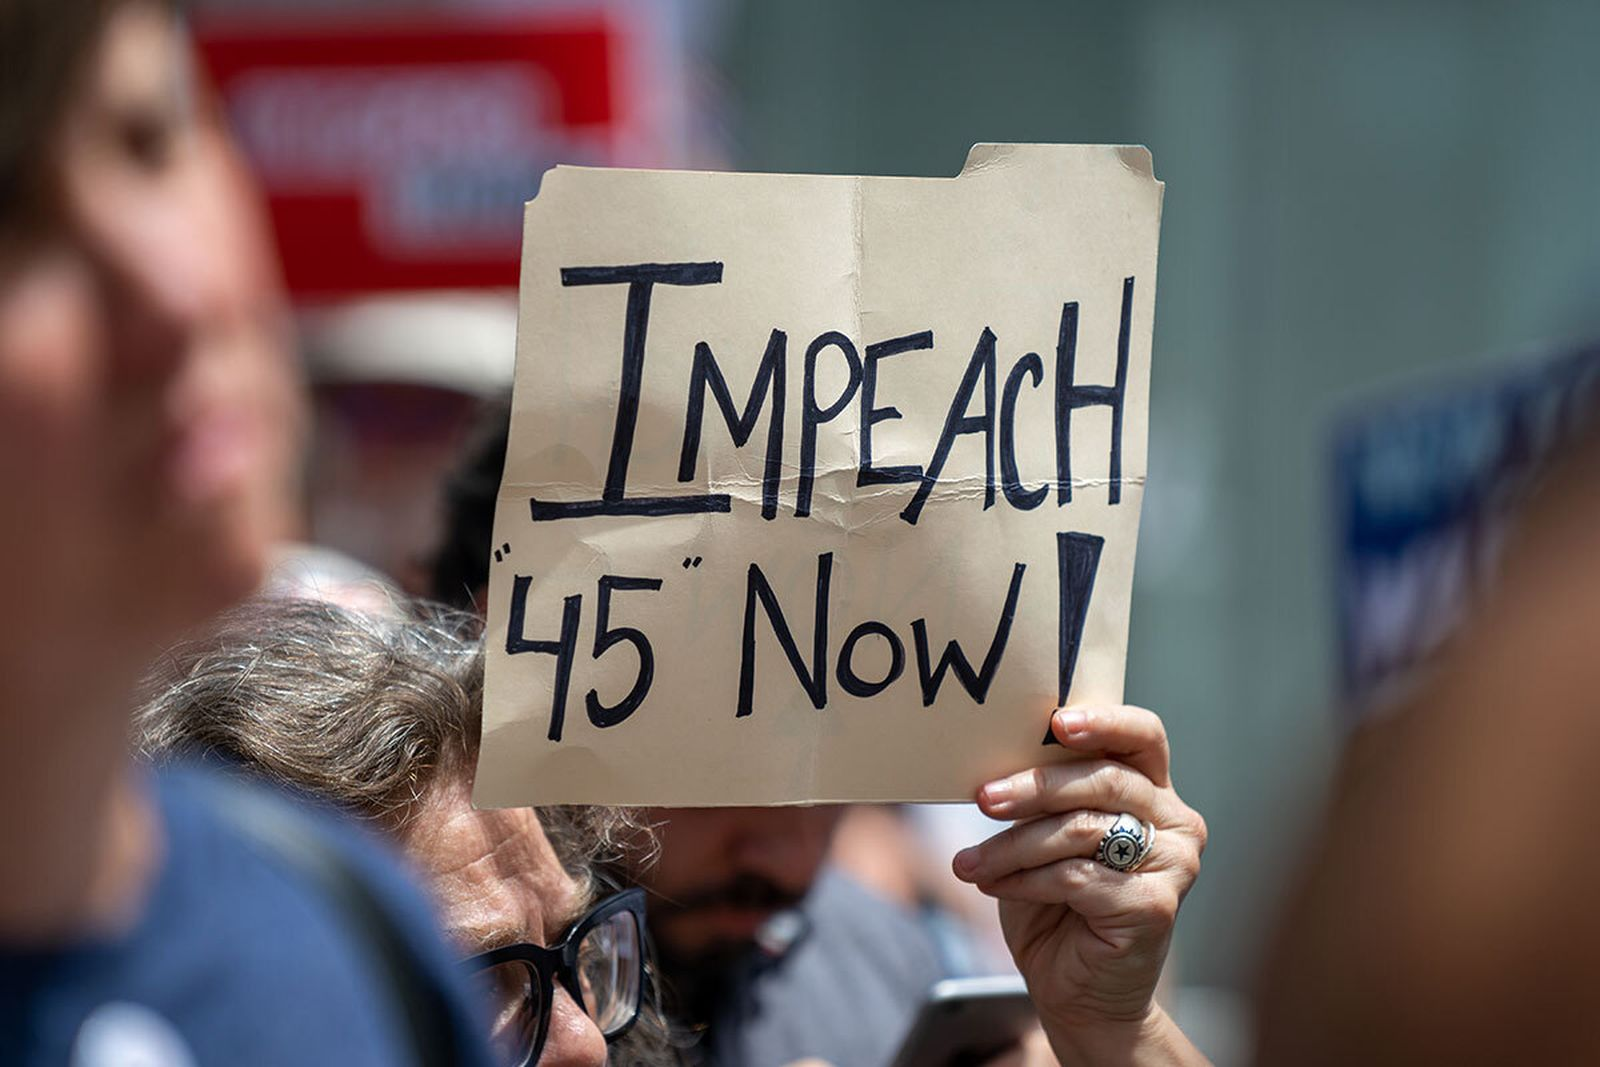 captiol-hill-impeach-trump-01